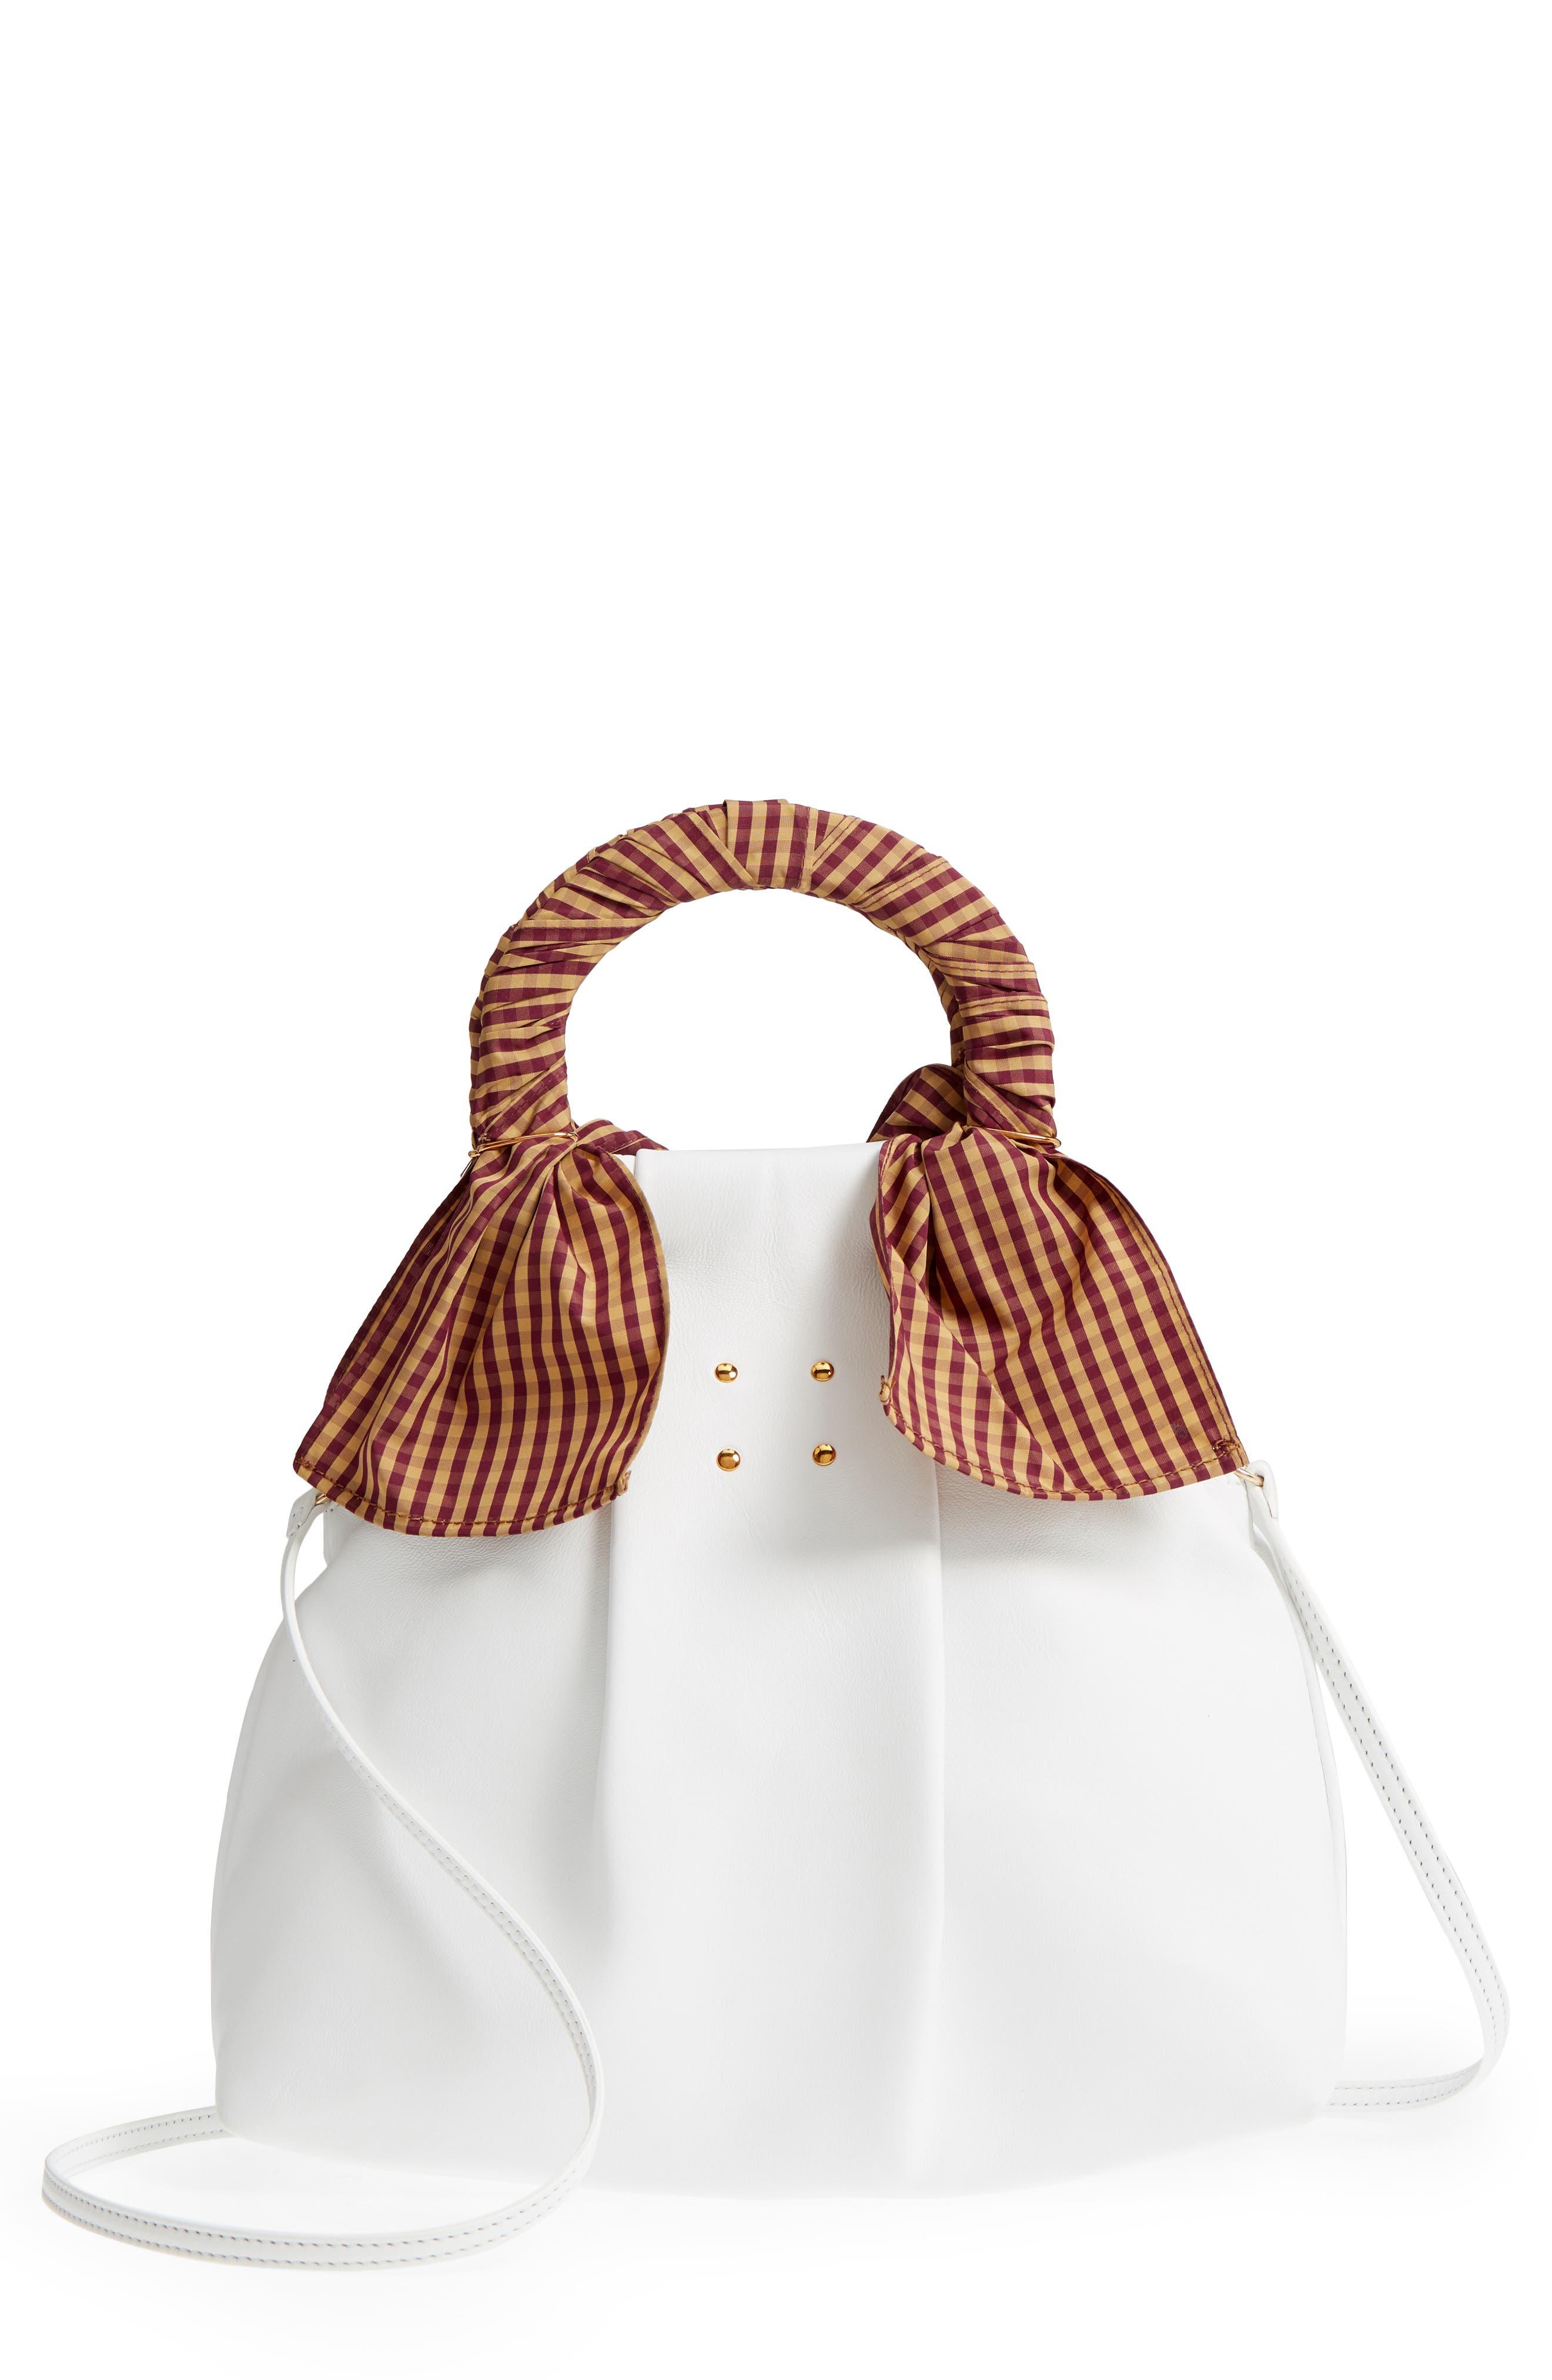 Hazel Leather Shopper,                             Main thumbnail 1, color,                             White